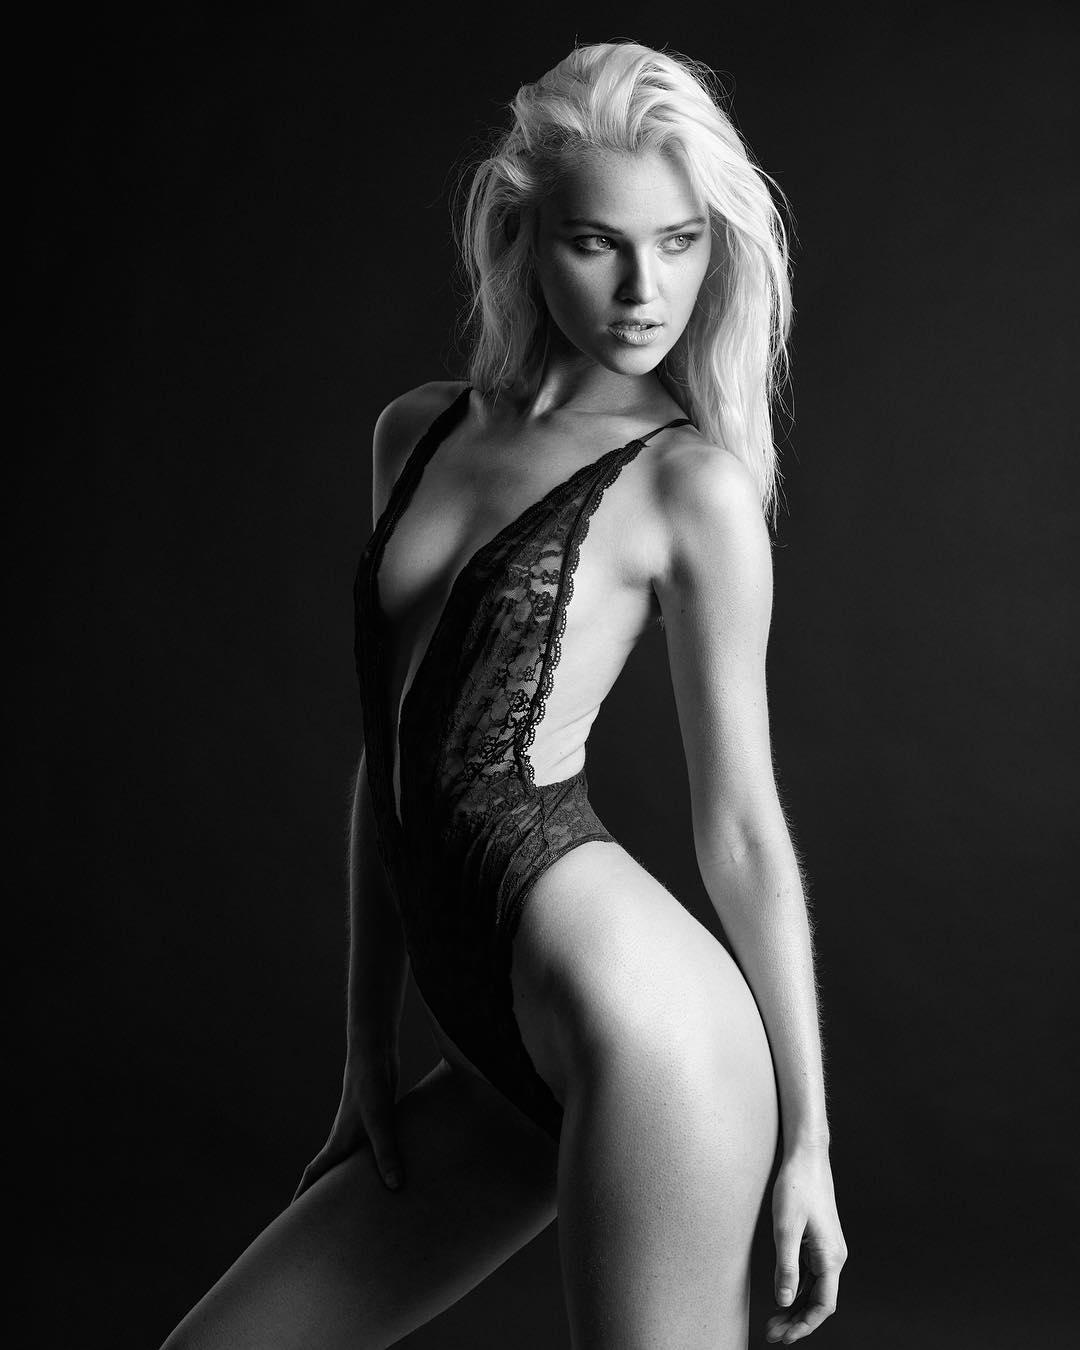 Selfie Alexa Reynen nude (23 foto and video), Ass, Bikini, Boobs, bra 2017